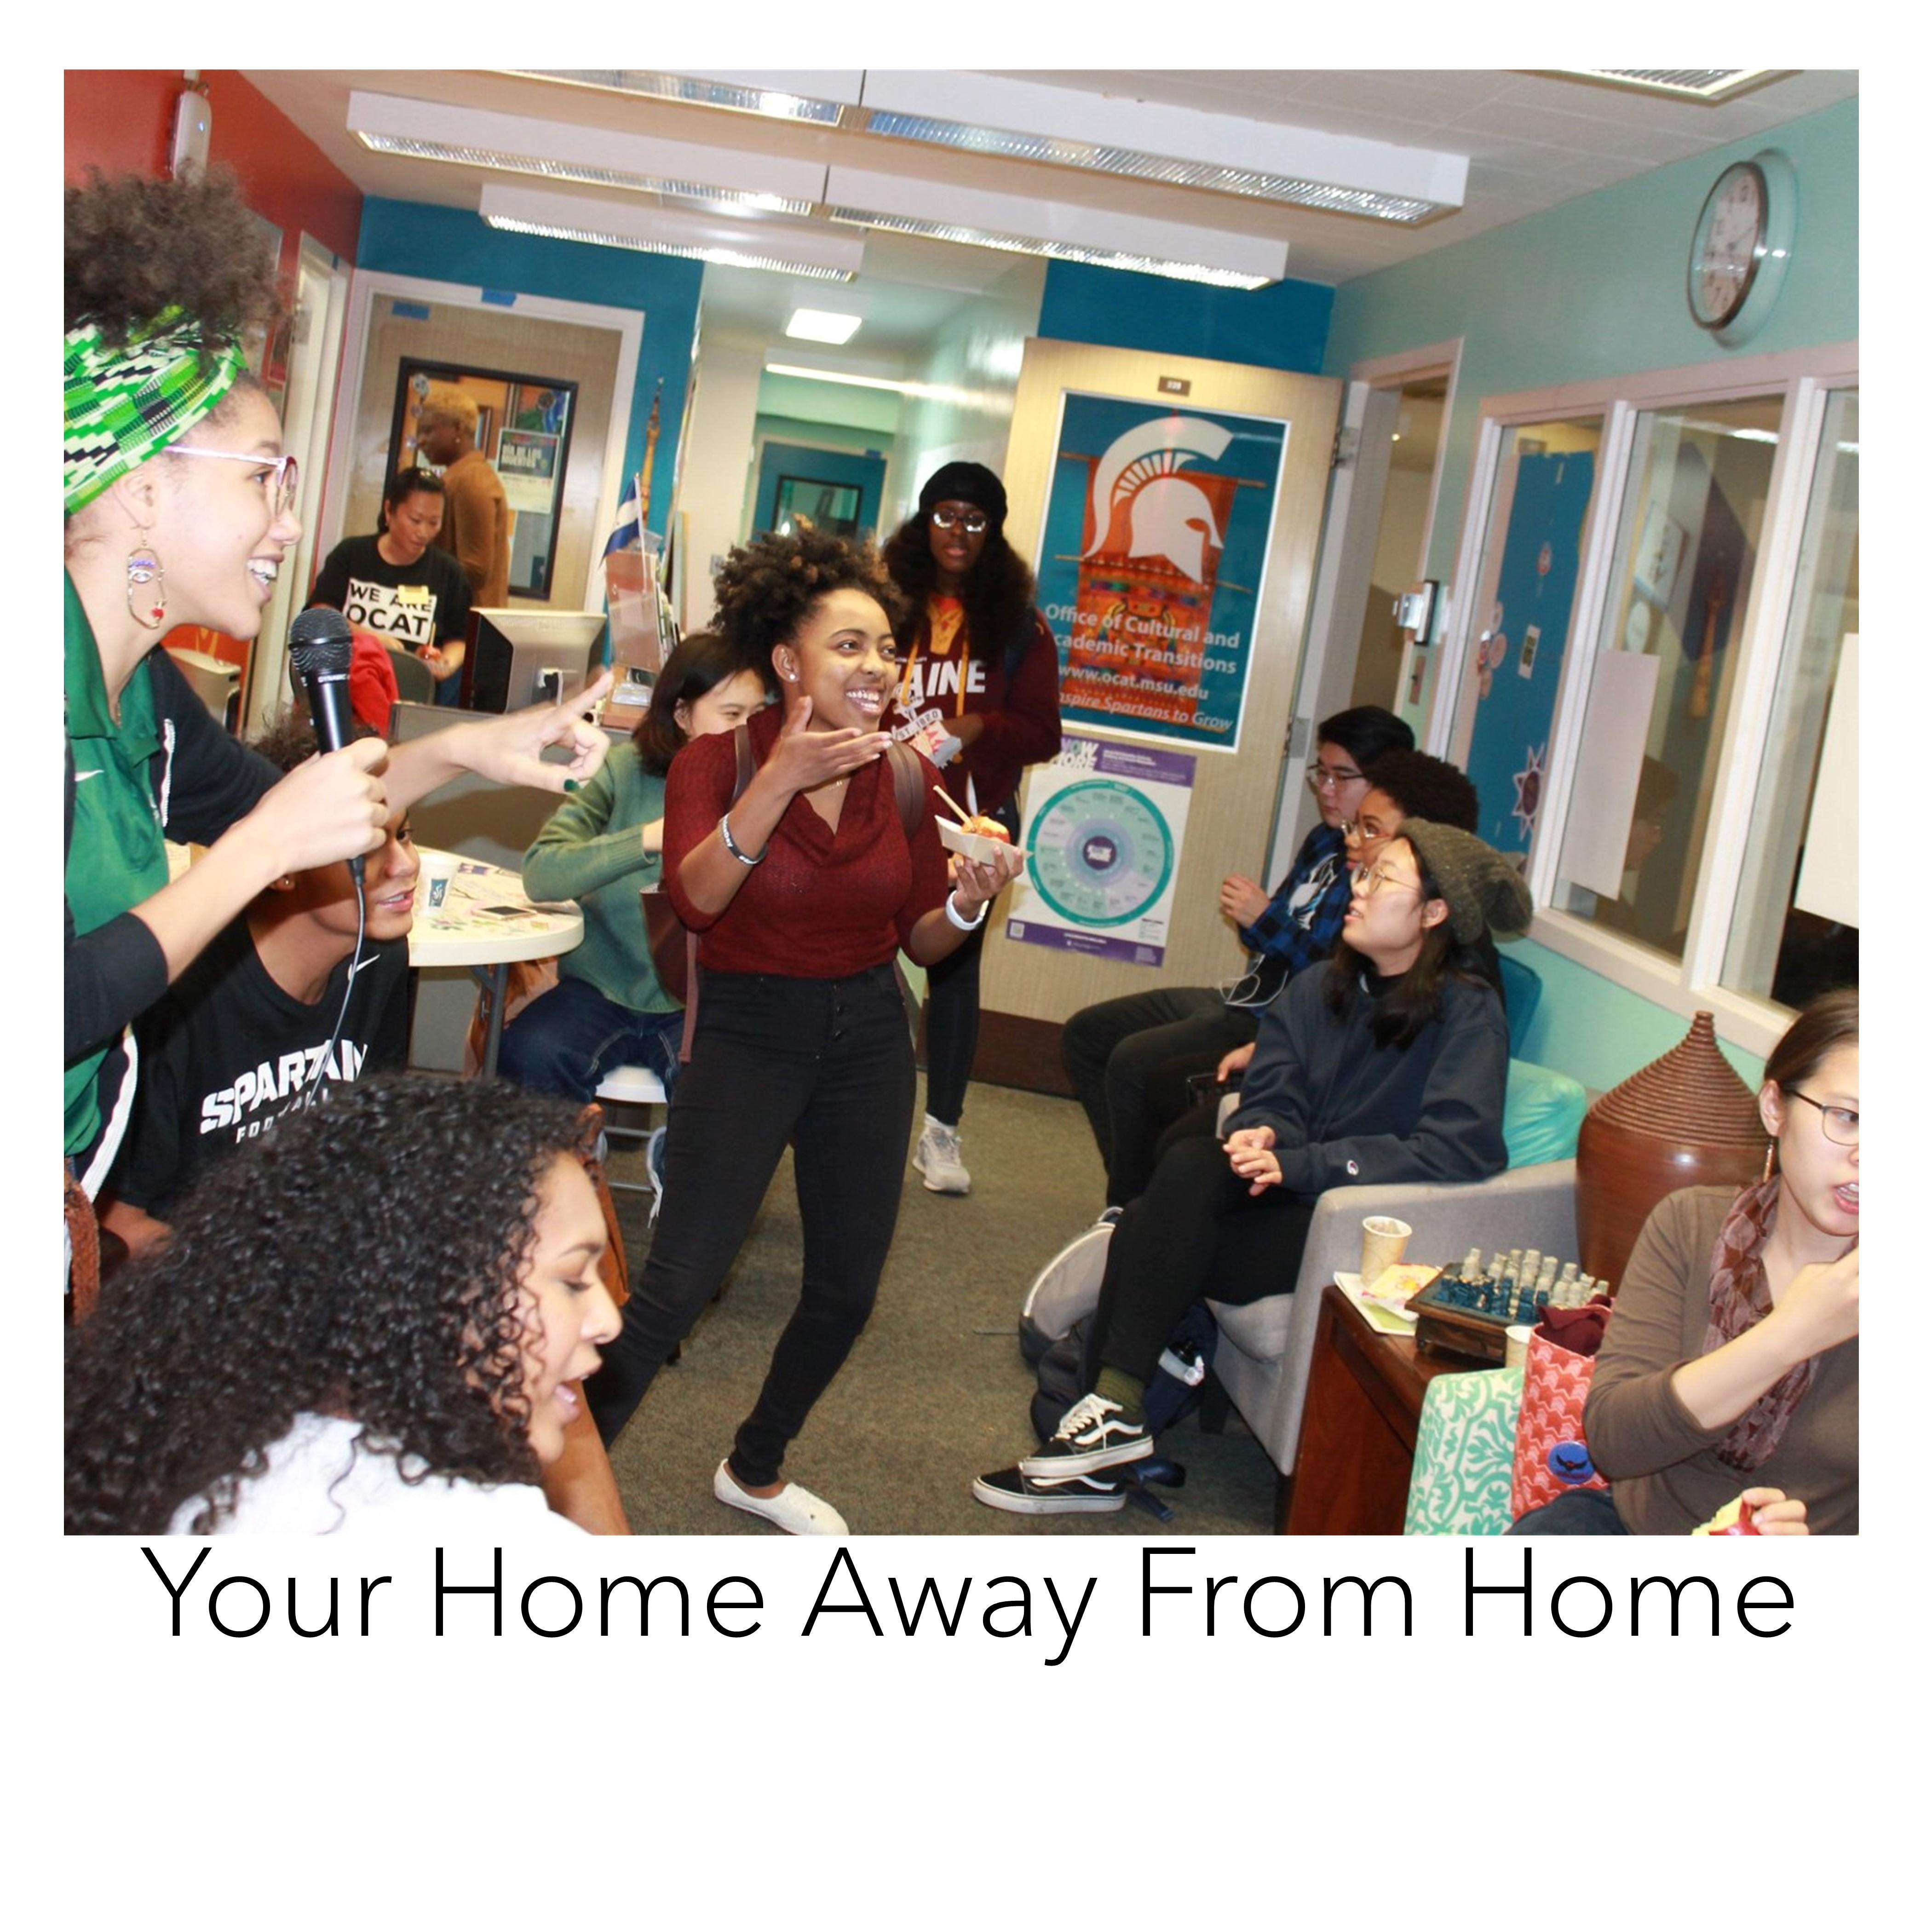 https://ocat.msu.edu/wp-content/uploads/2020/07/Your-Home-Away-From-Home.jpg